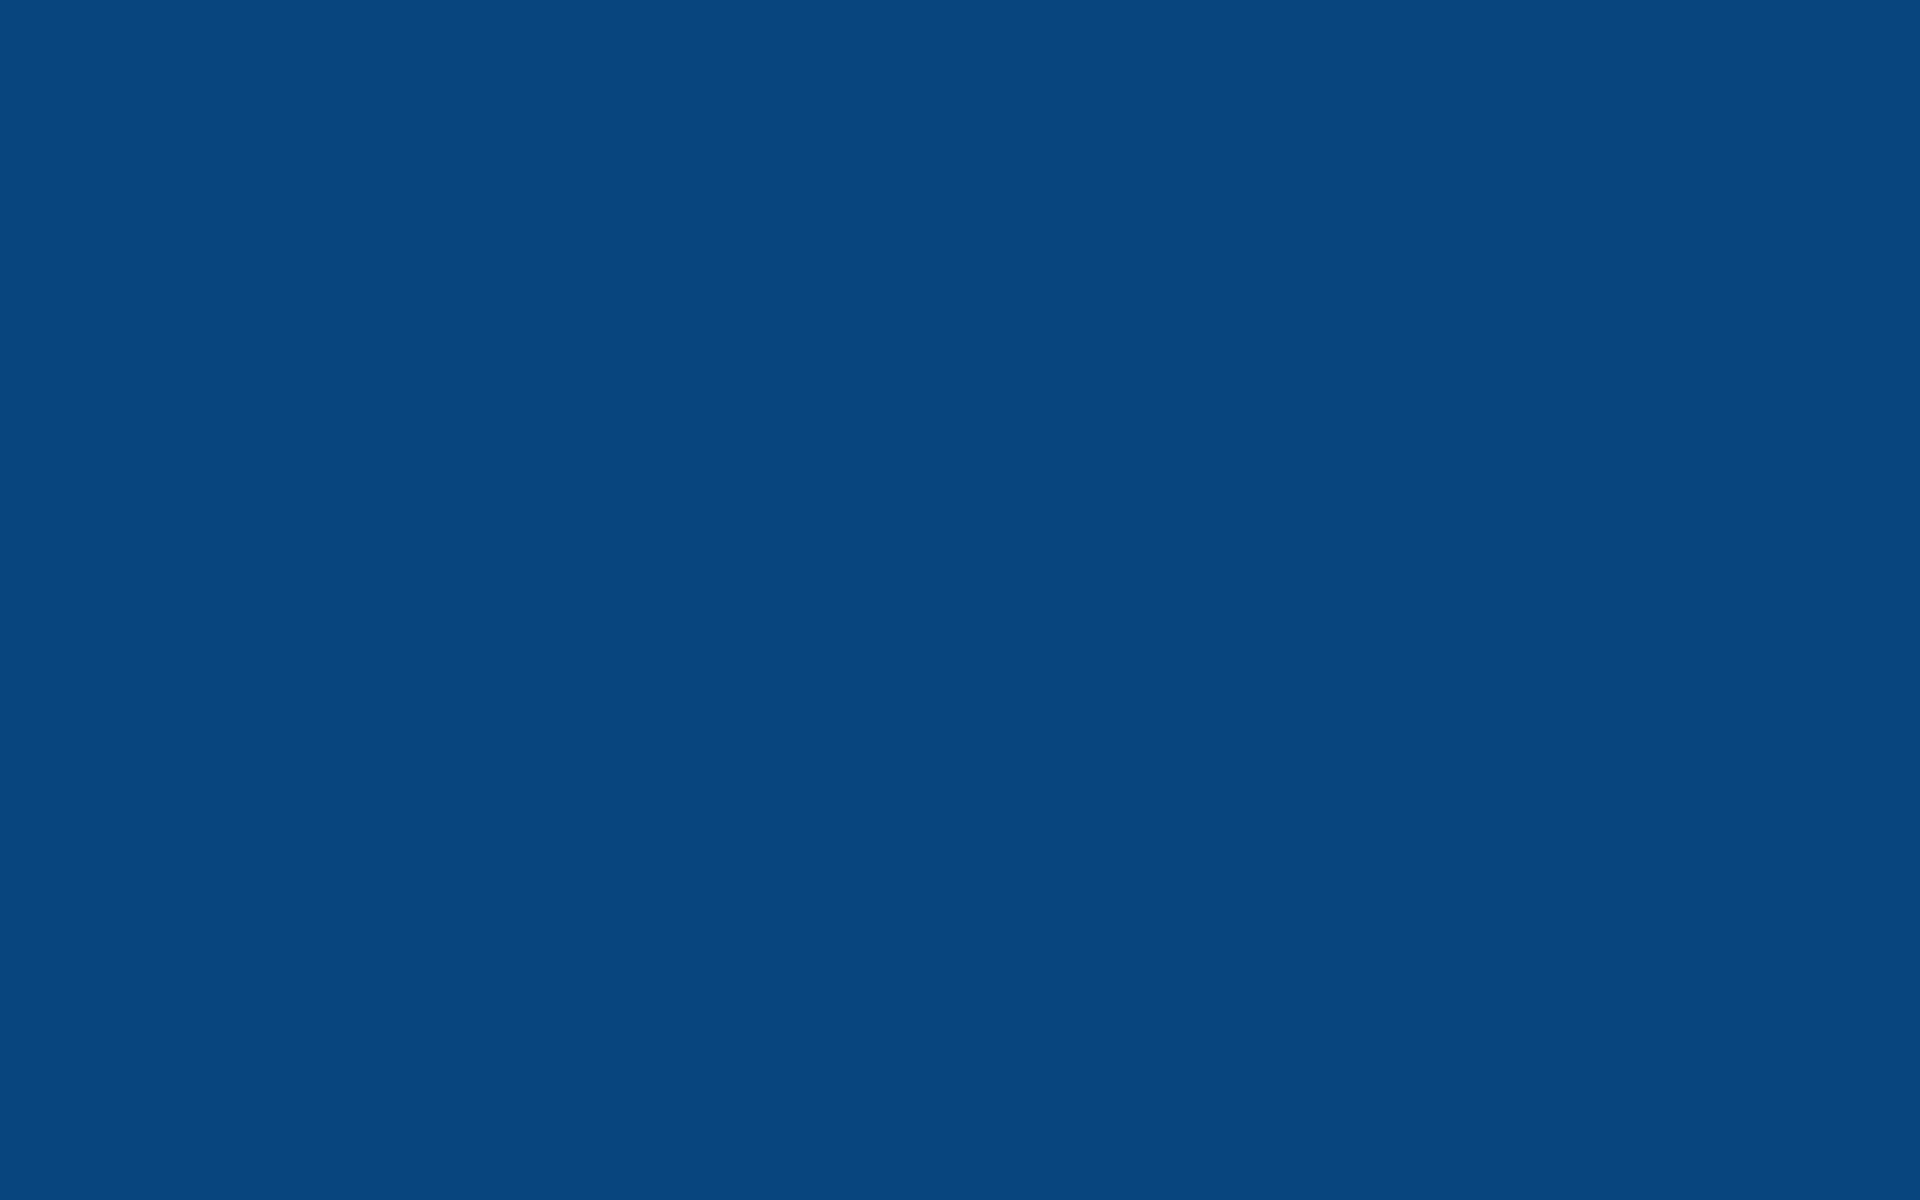 1920x1200 Dark Cerulean Solid Color Background